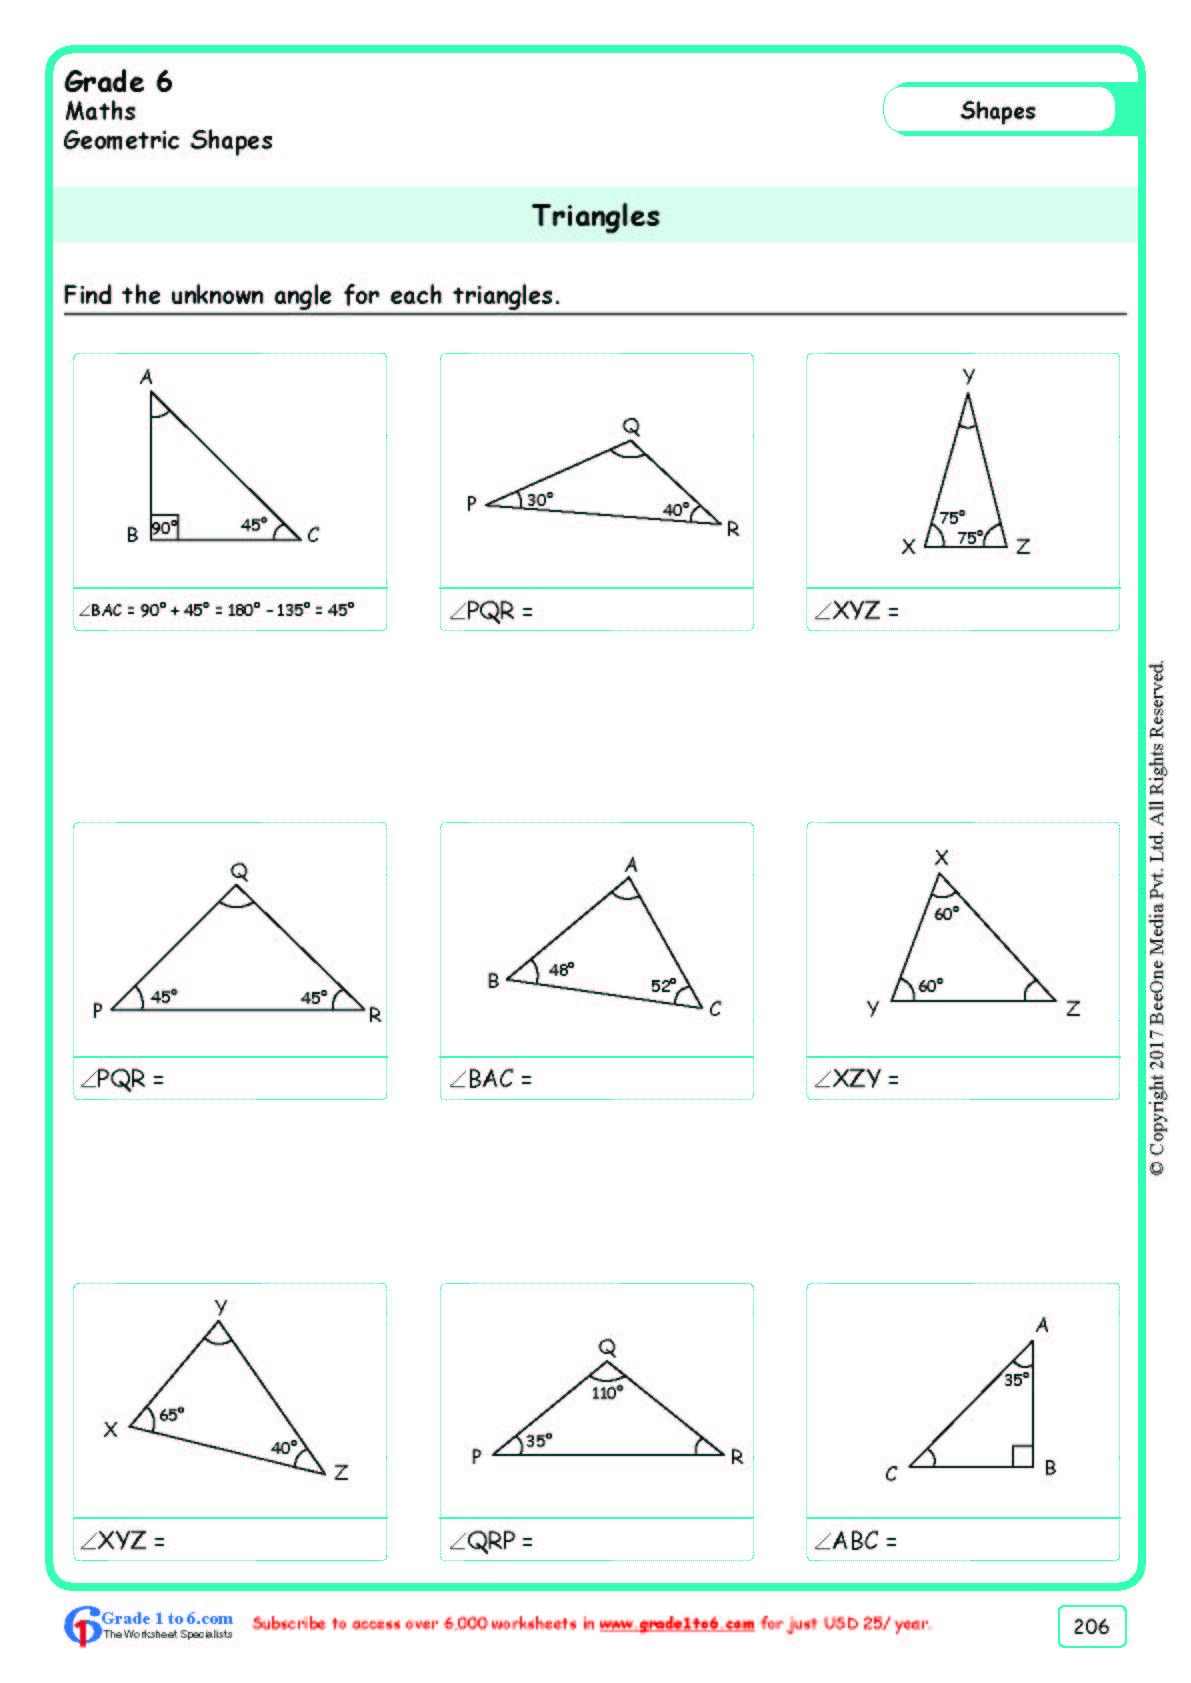 Free Math Worksheets For Grade 6 Class 6 Ib Cbse Icse K12